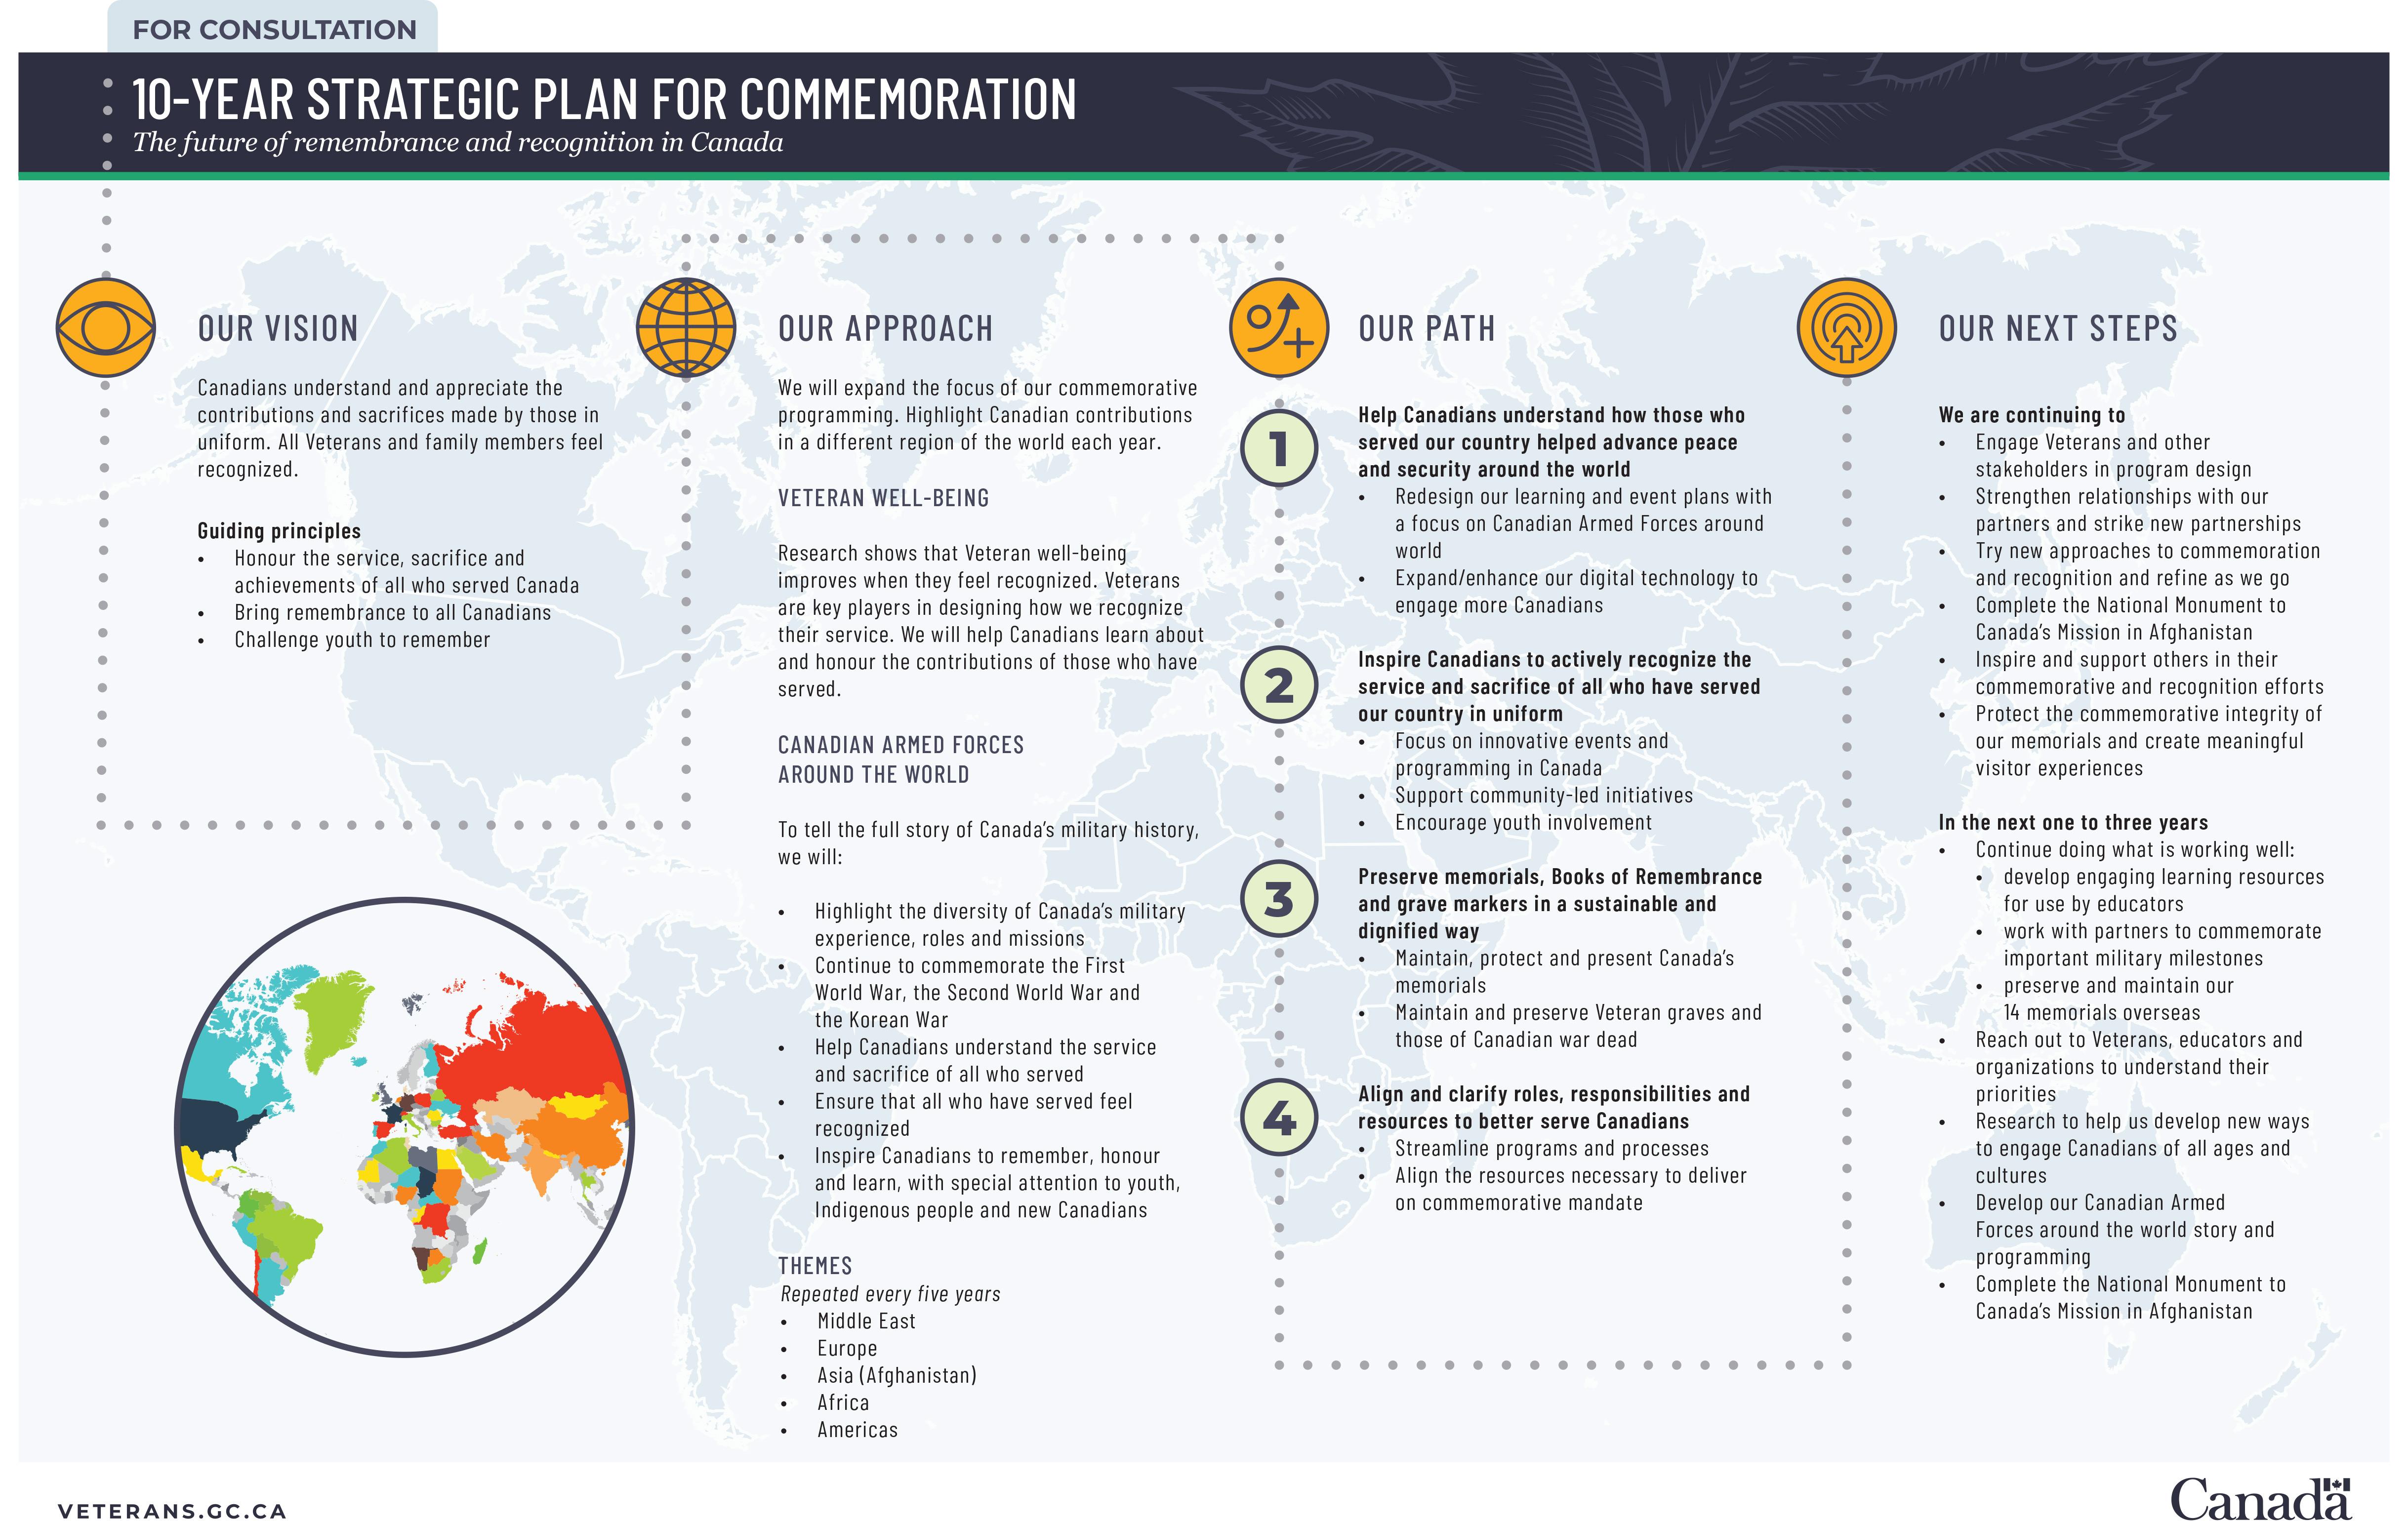 10-year strategic plan for commemoration